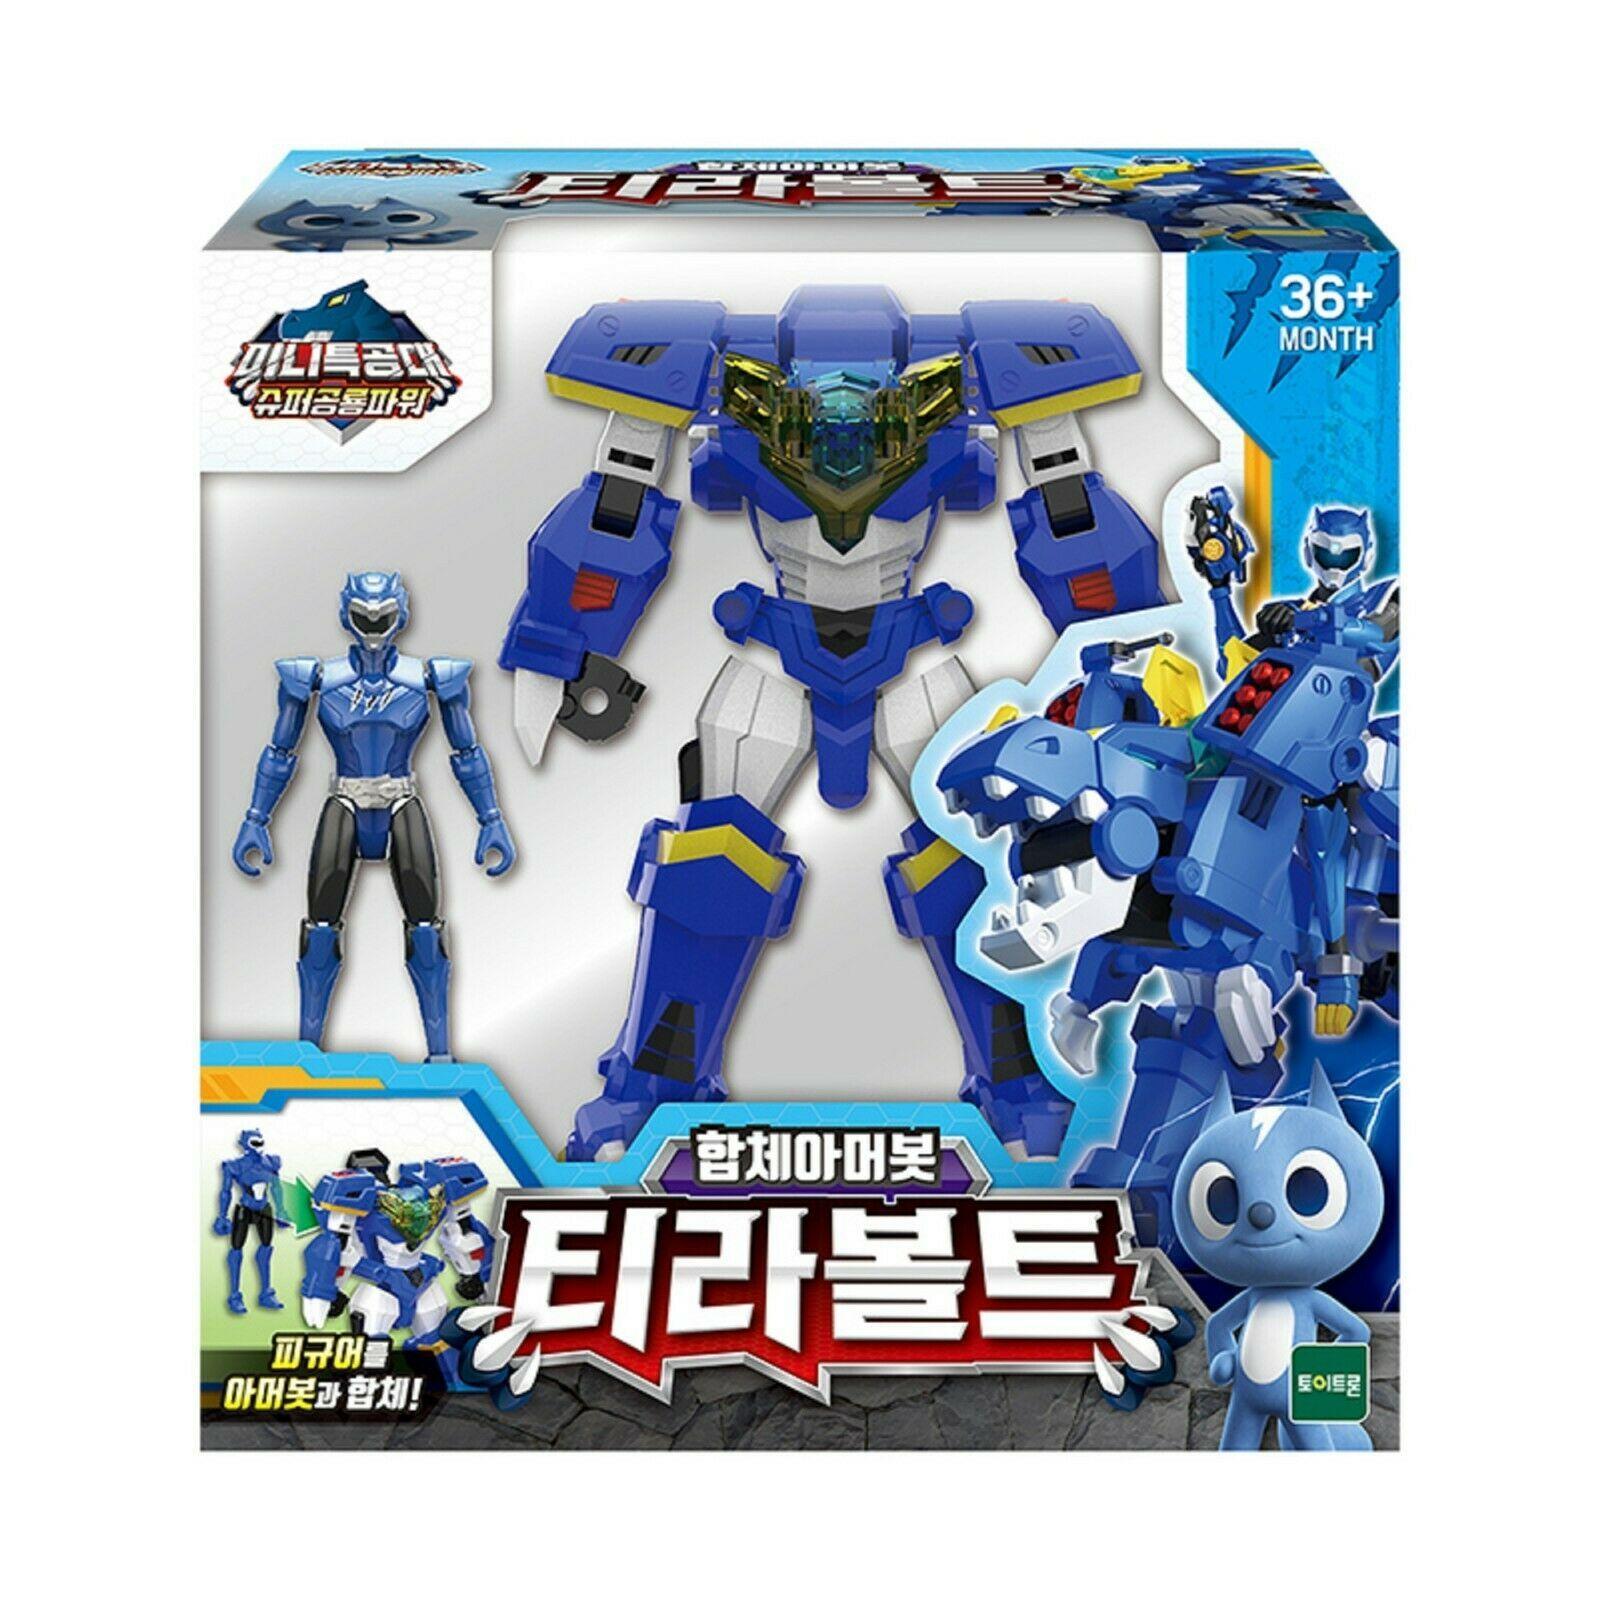 Miniforce Tyra Volt Transformation Action Figure Super Dinosaur Power Part 2 Toy